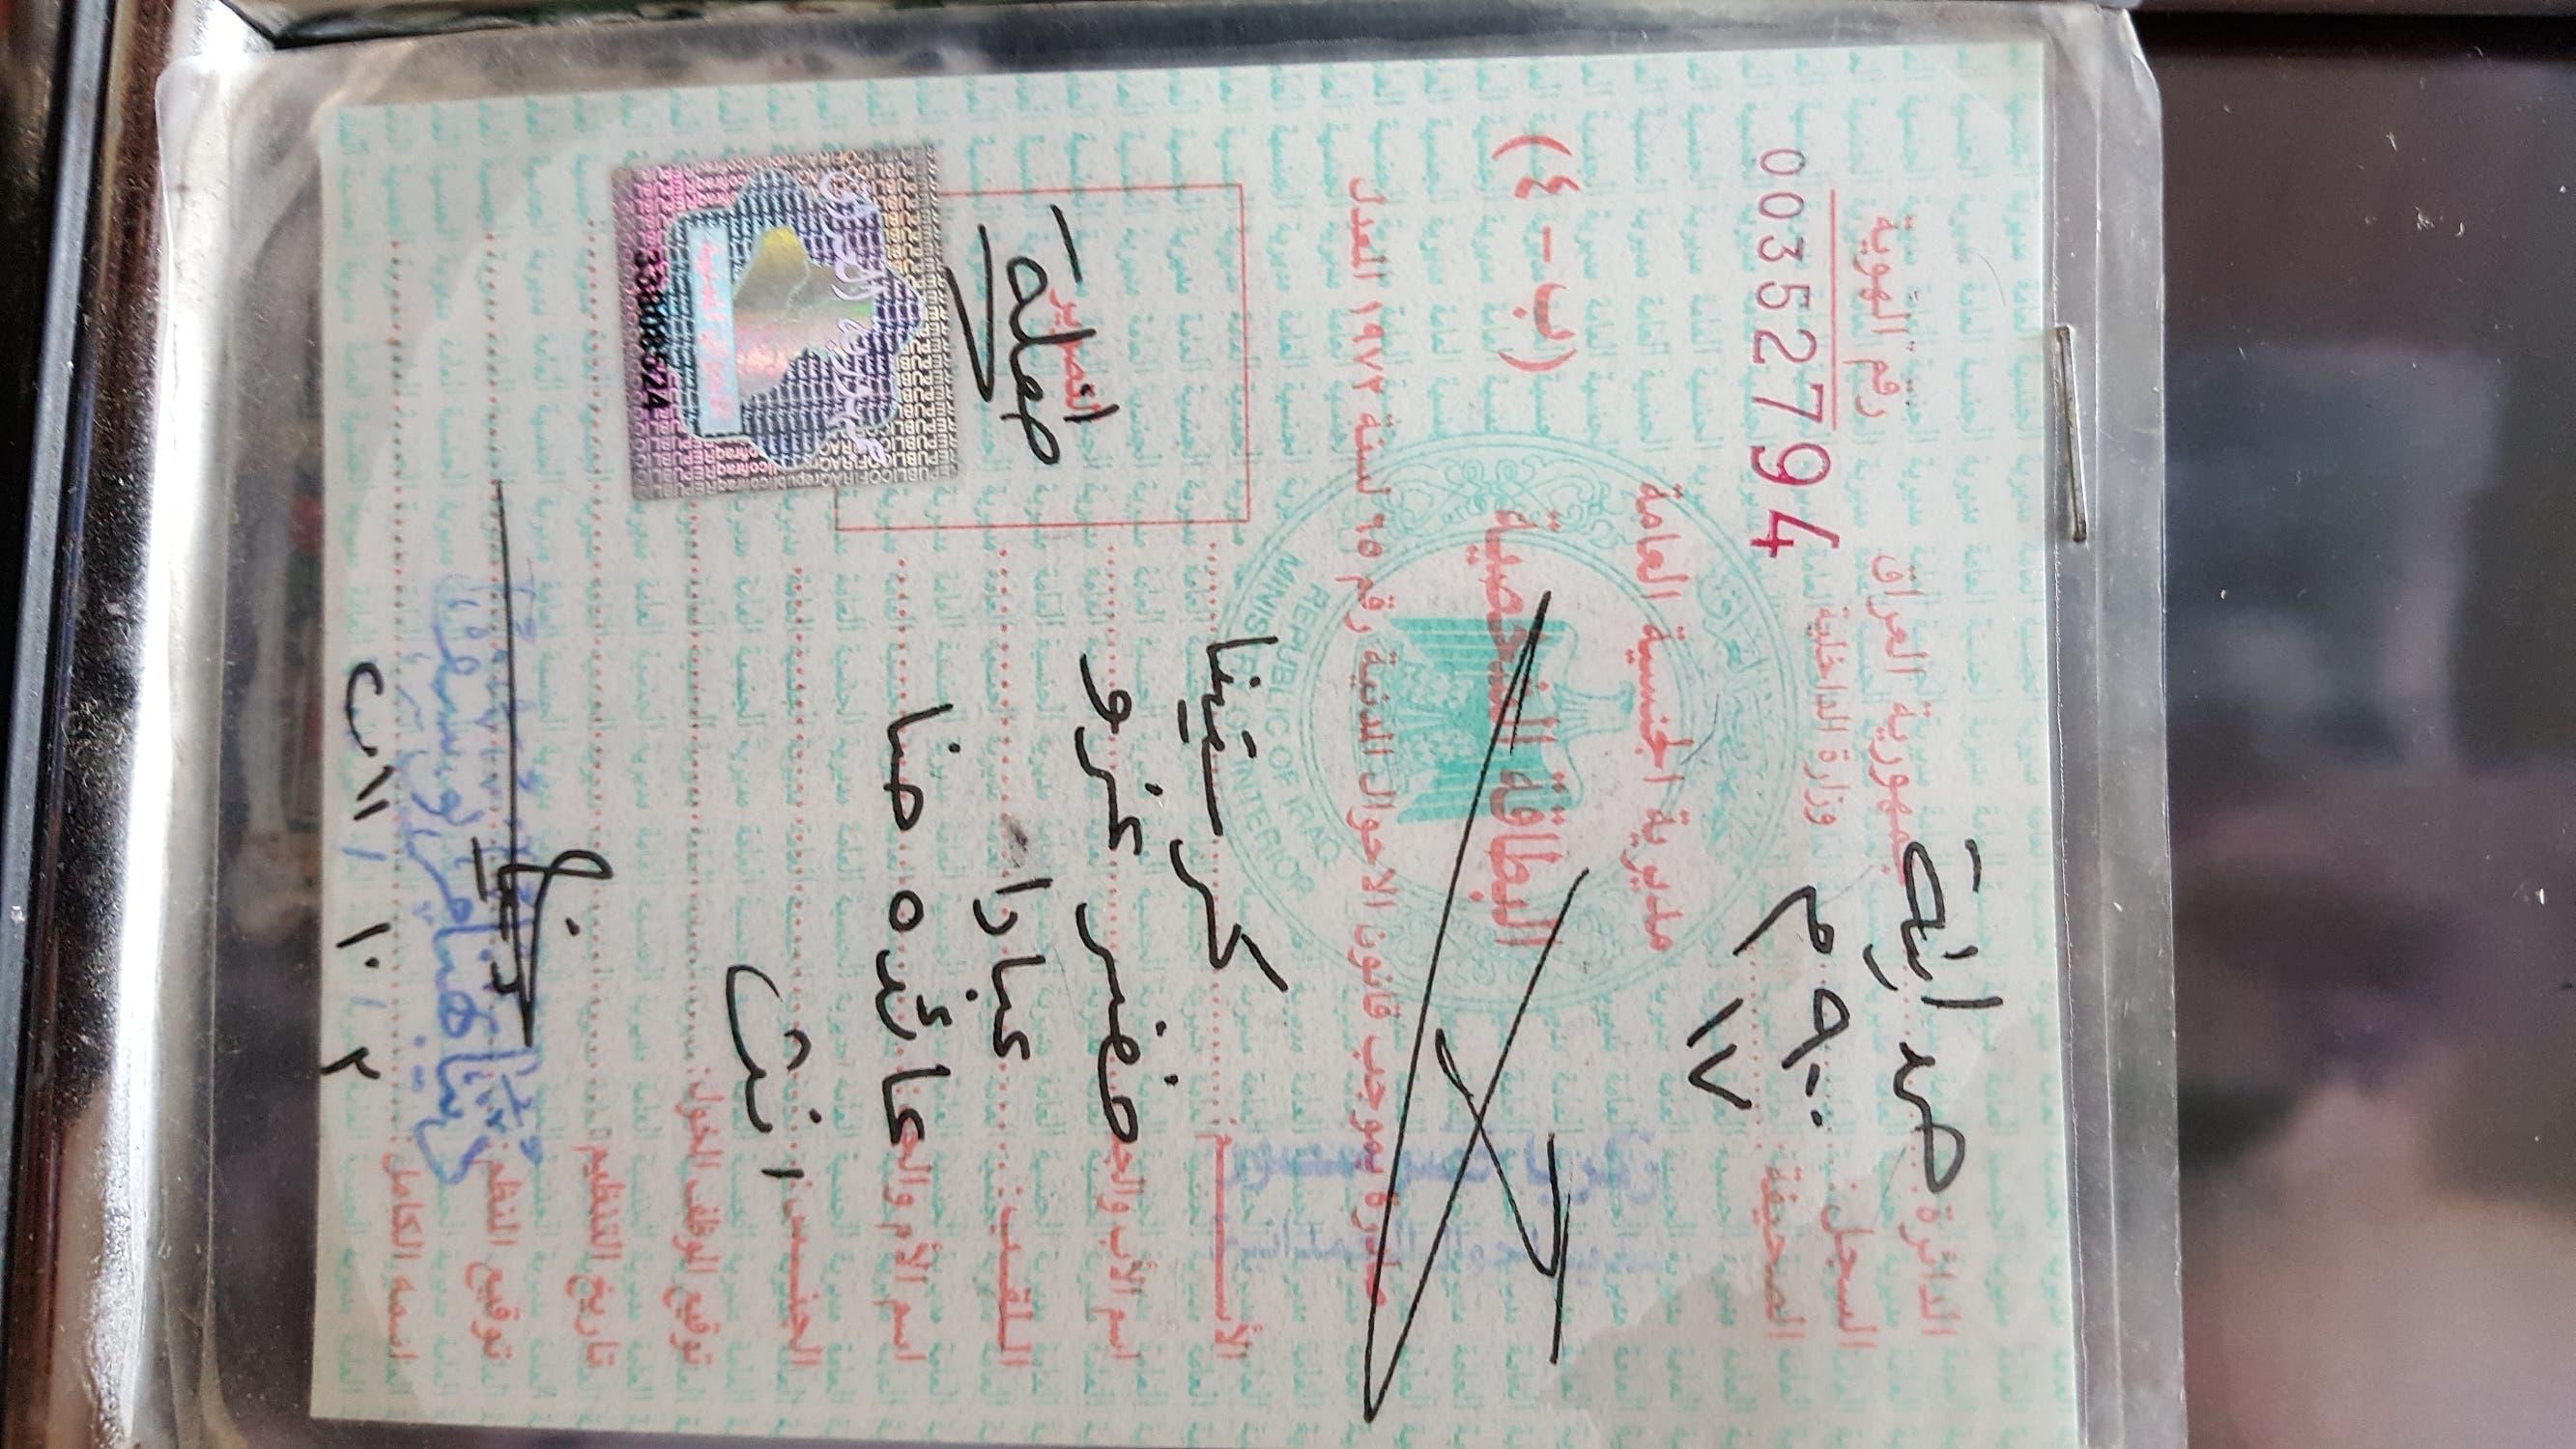 Christina's ID paper. (Alarabiya)